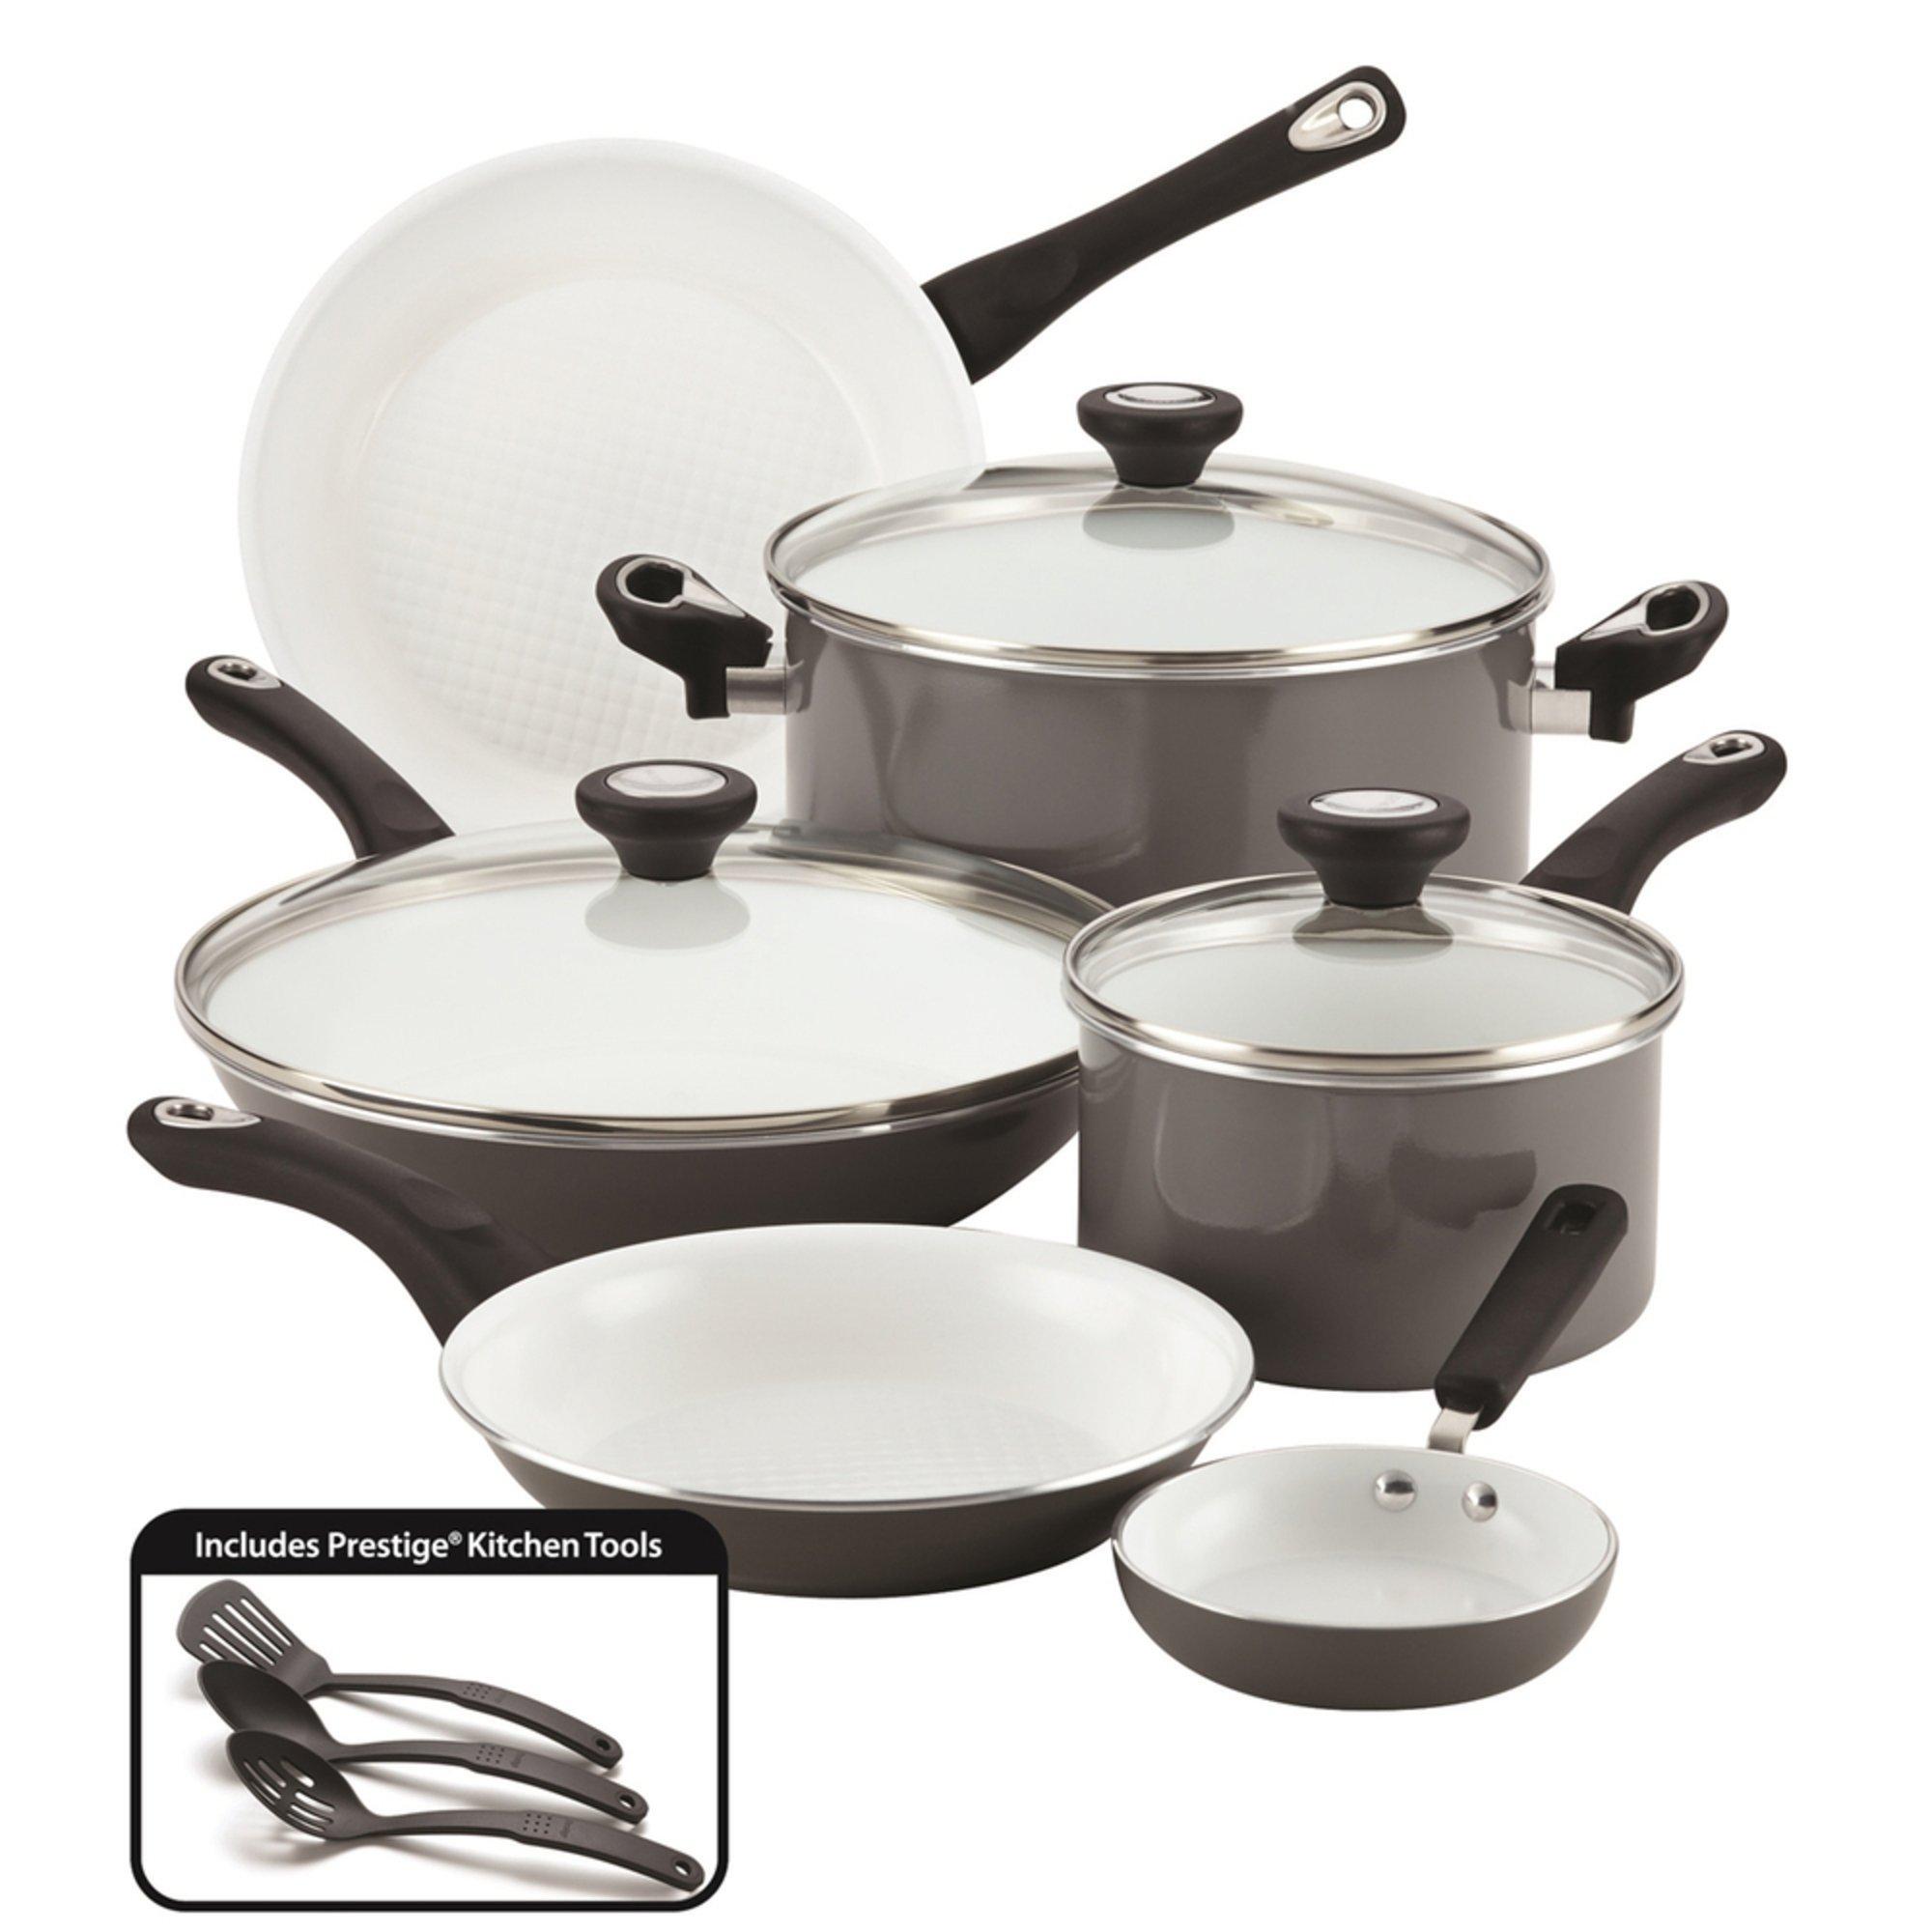 Farberware 12-piece Ceramic Cookware Set, Gray | Cookware ...